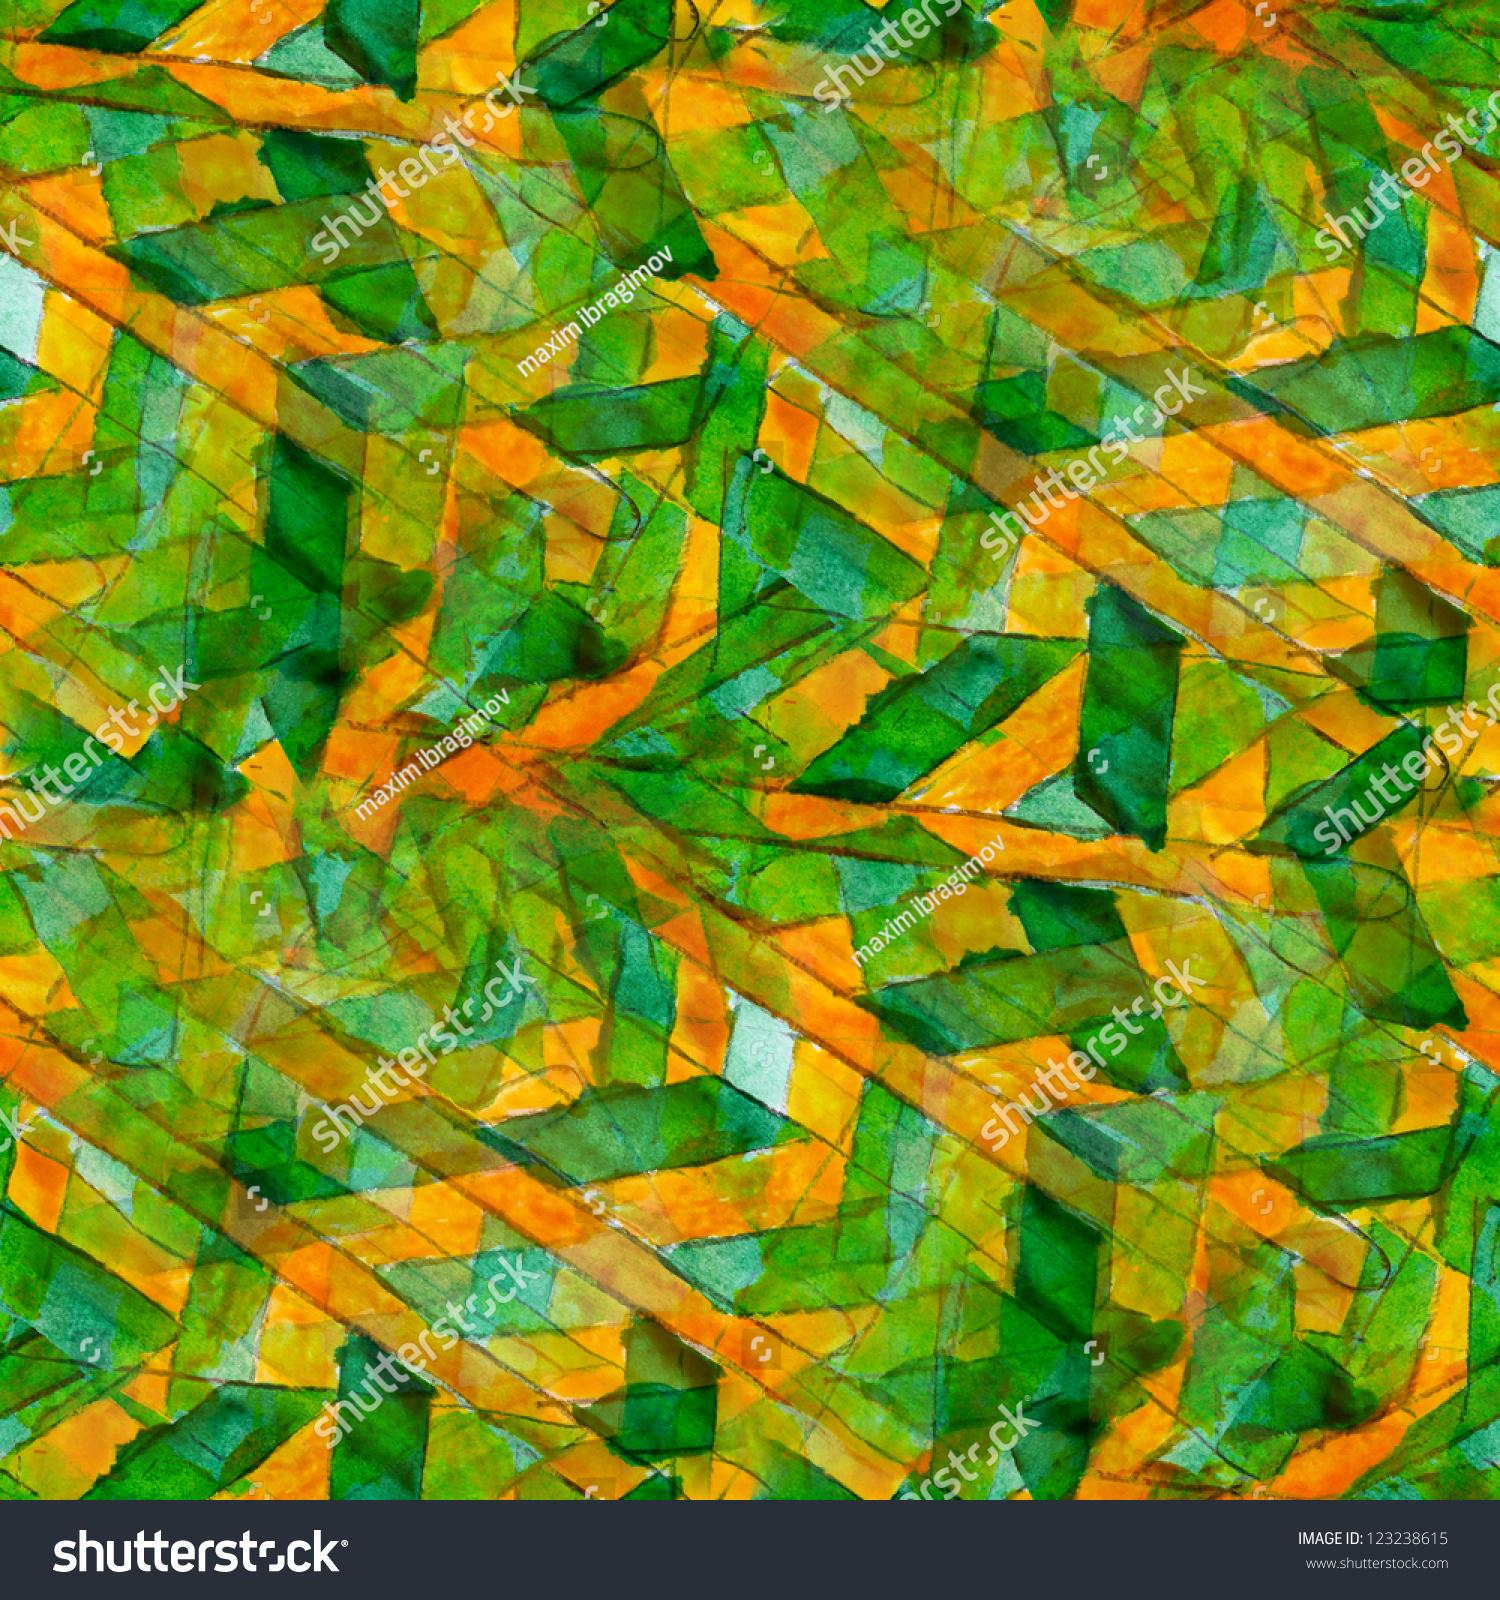 abstract yellow green drawing - photo #27